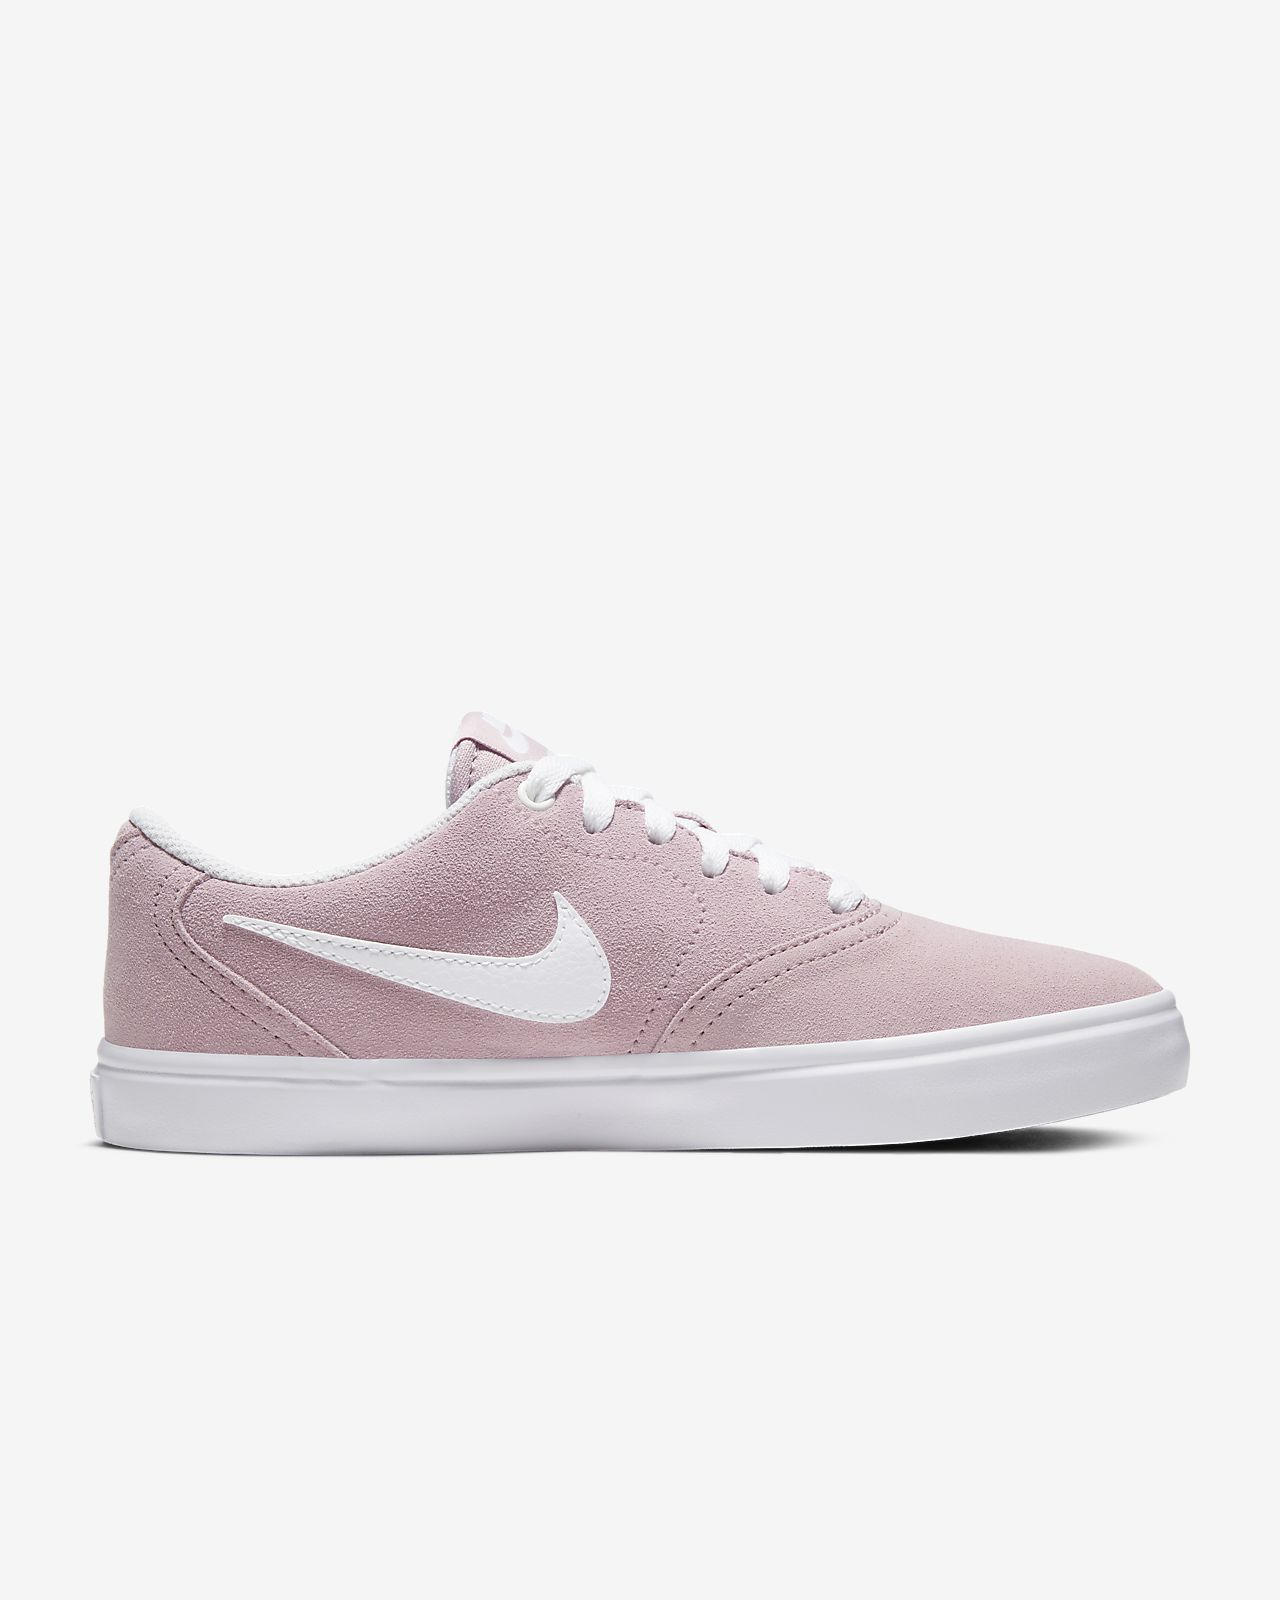 Sapatilhas de skateboard personalizáveis Nike SB Zoom Stefan